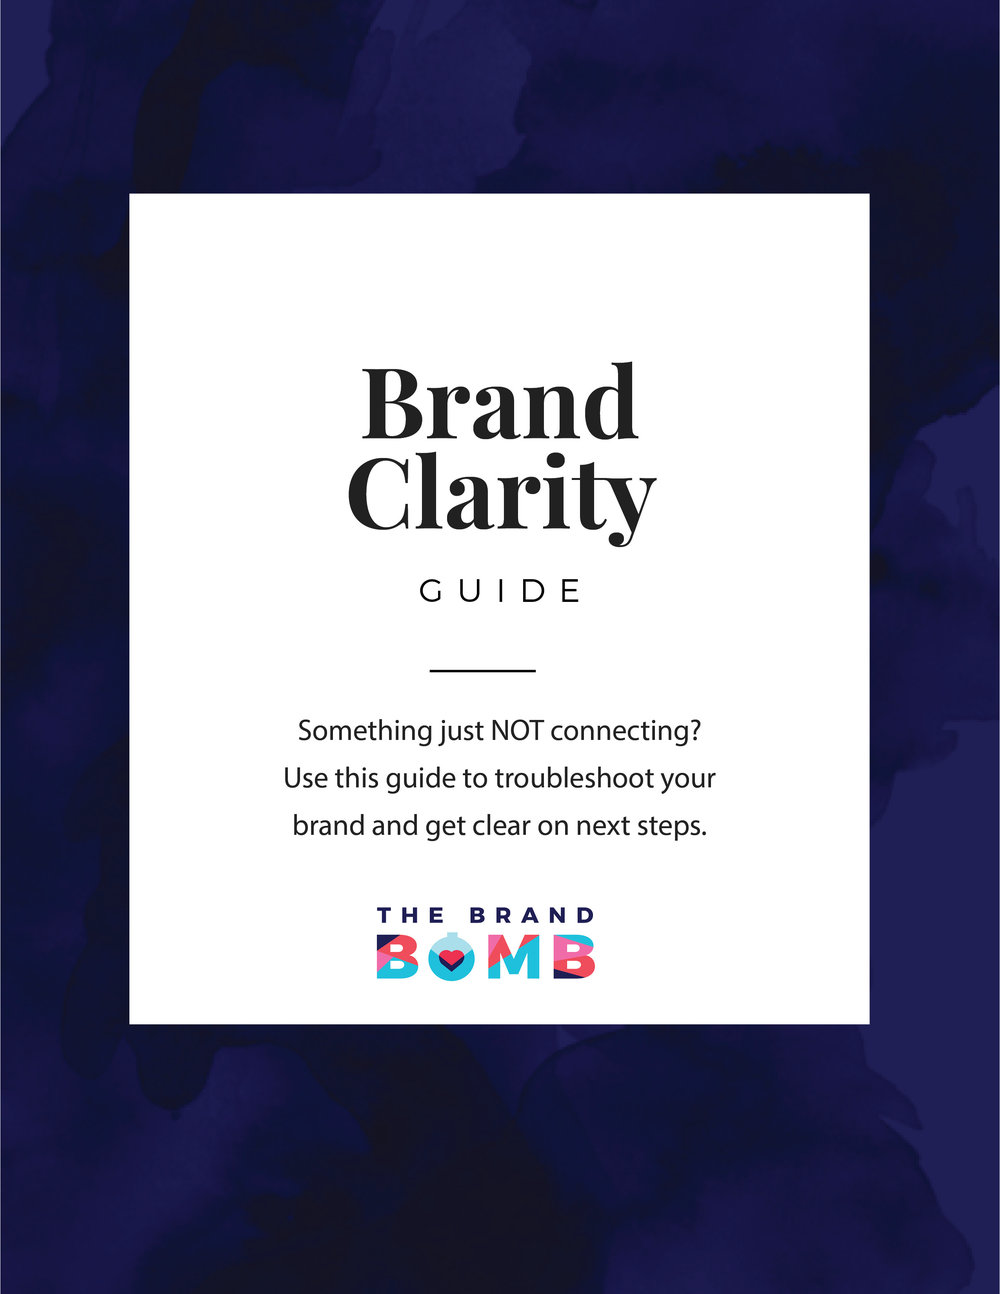 brandclarity.jpg